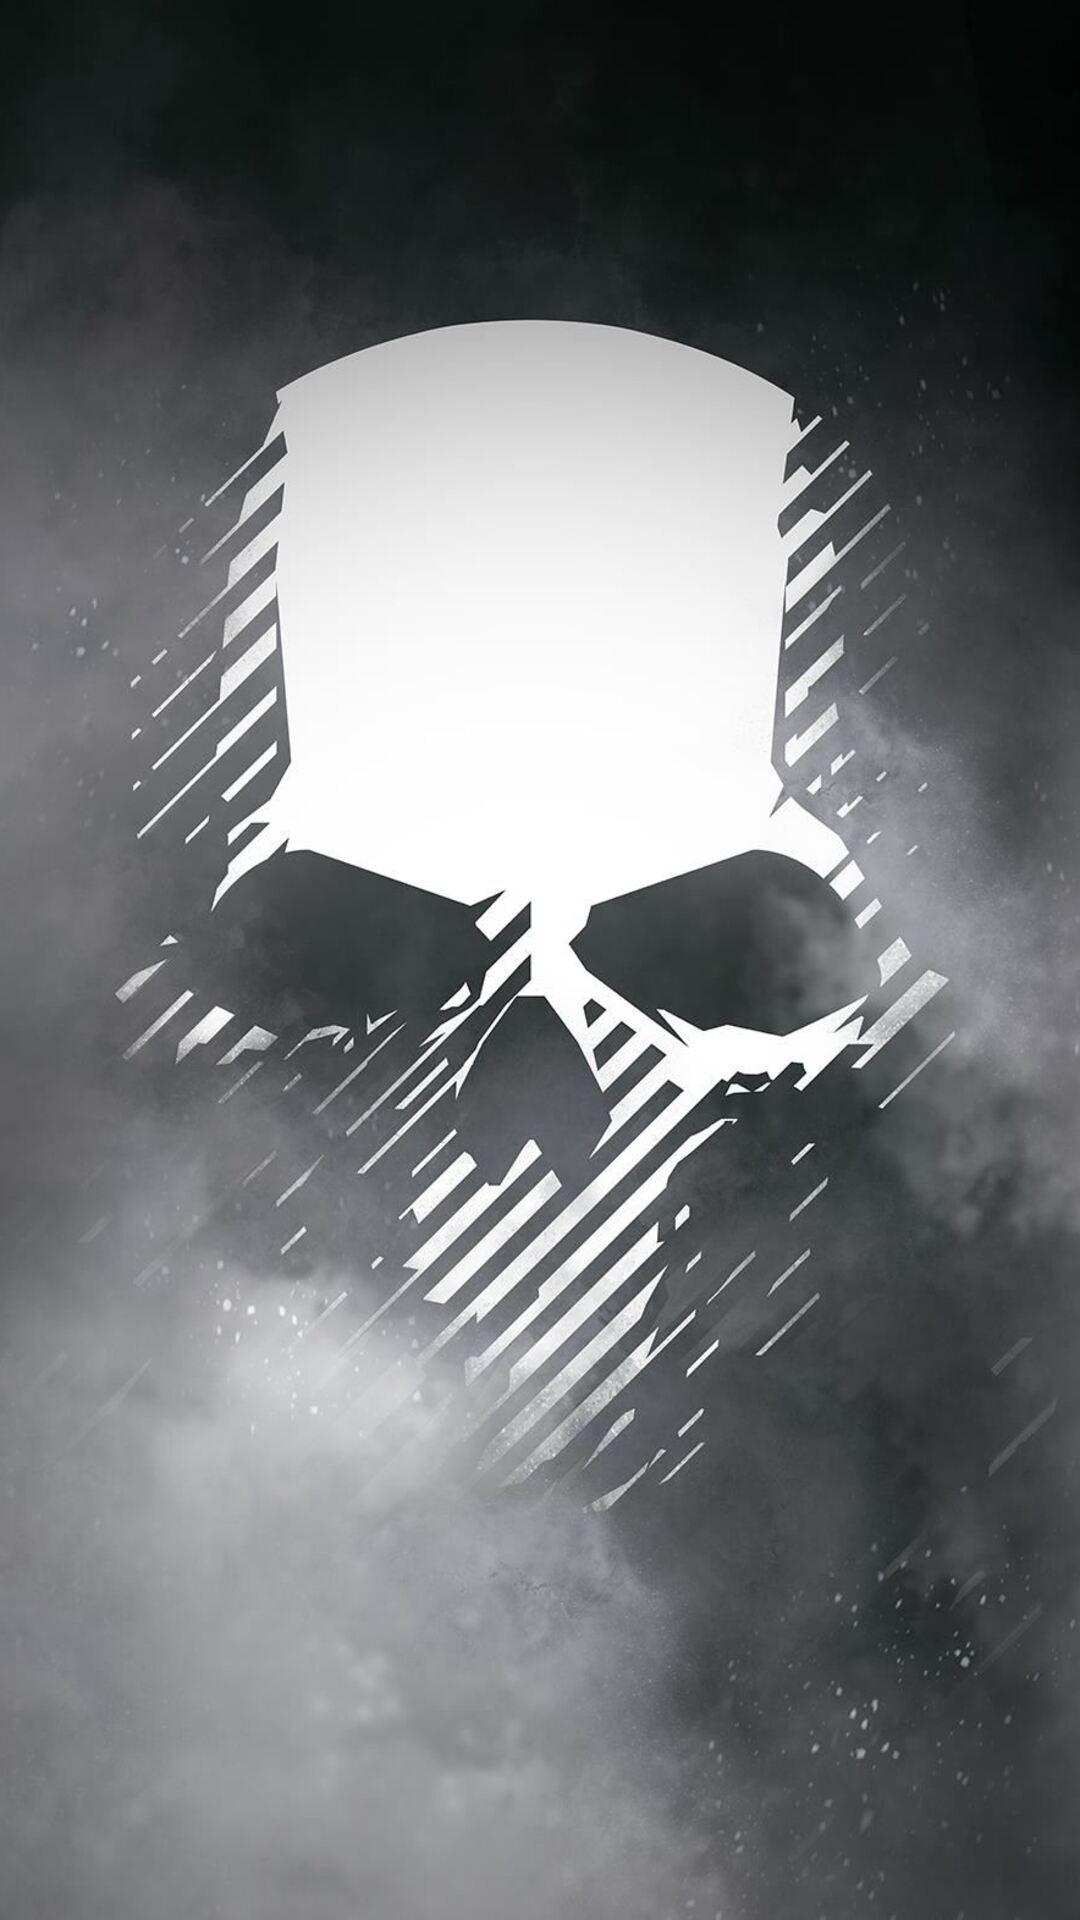 1080x1920 tom clancys ghost recon wildlands skull iphone 7 - Ghost recon wildlands mobile wallpaper ...